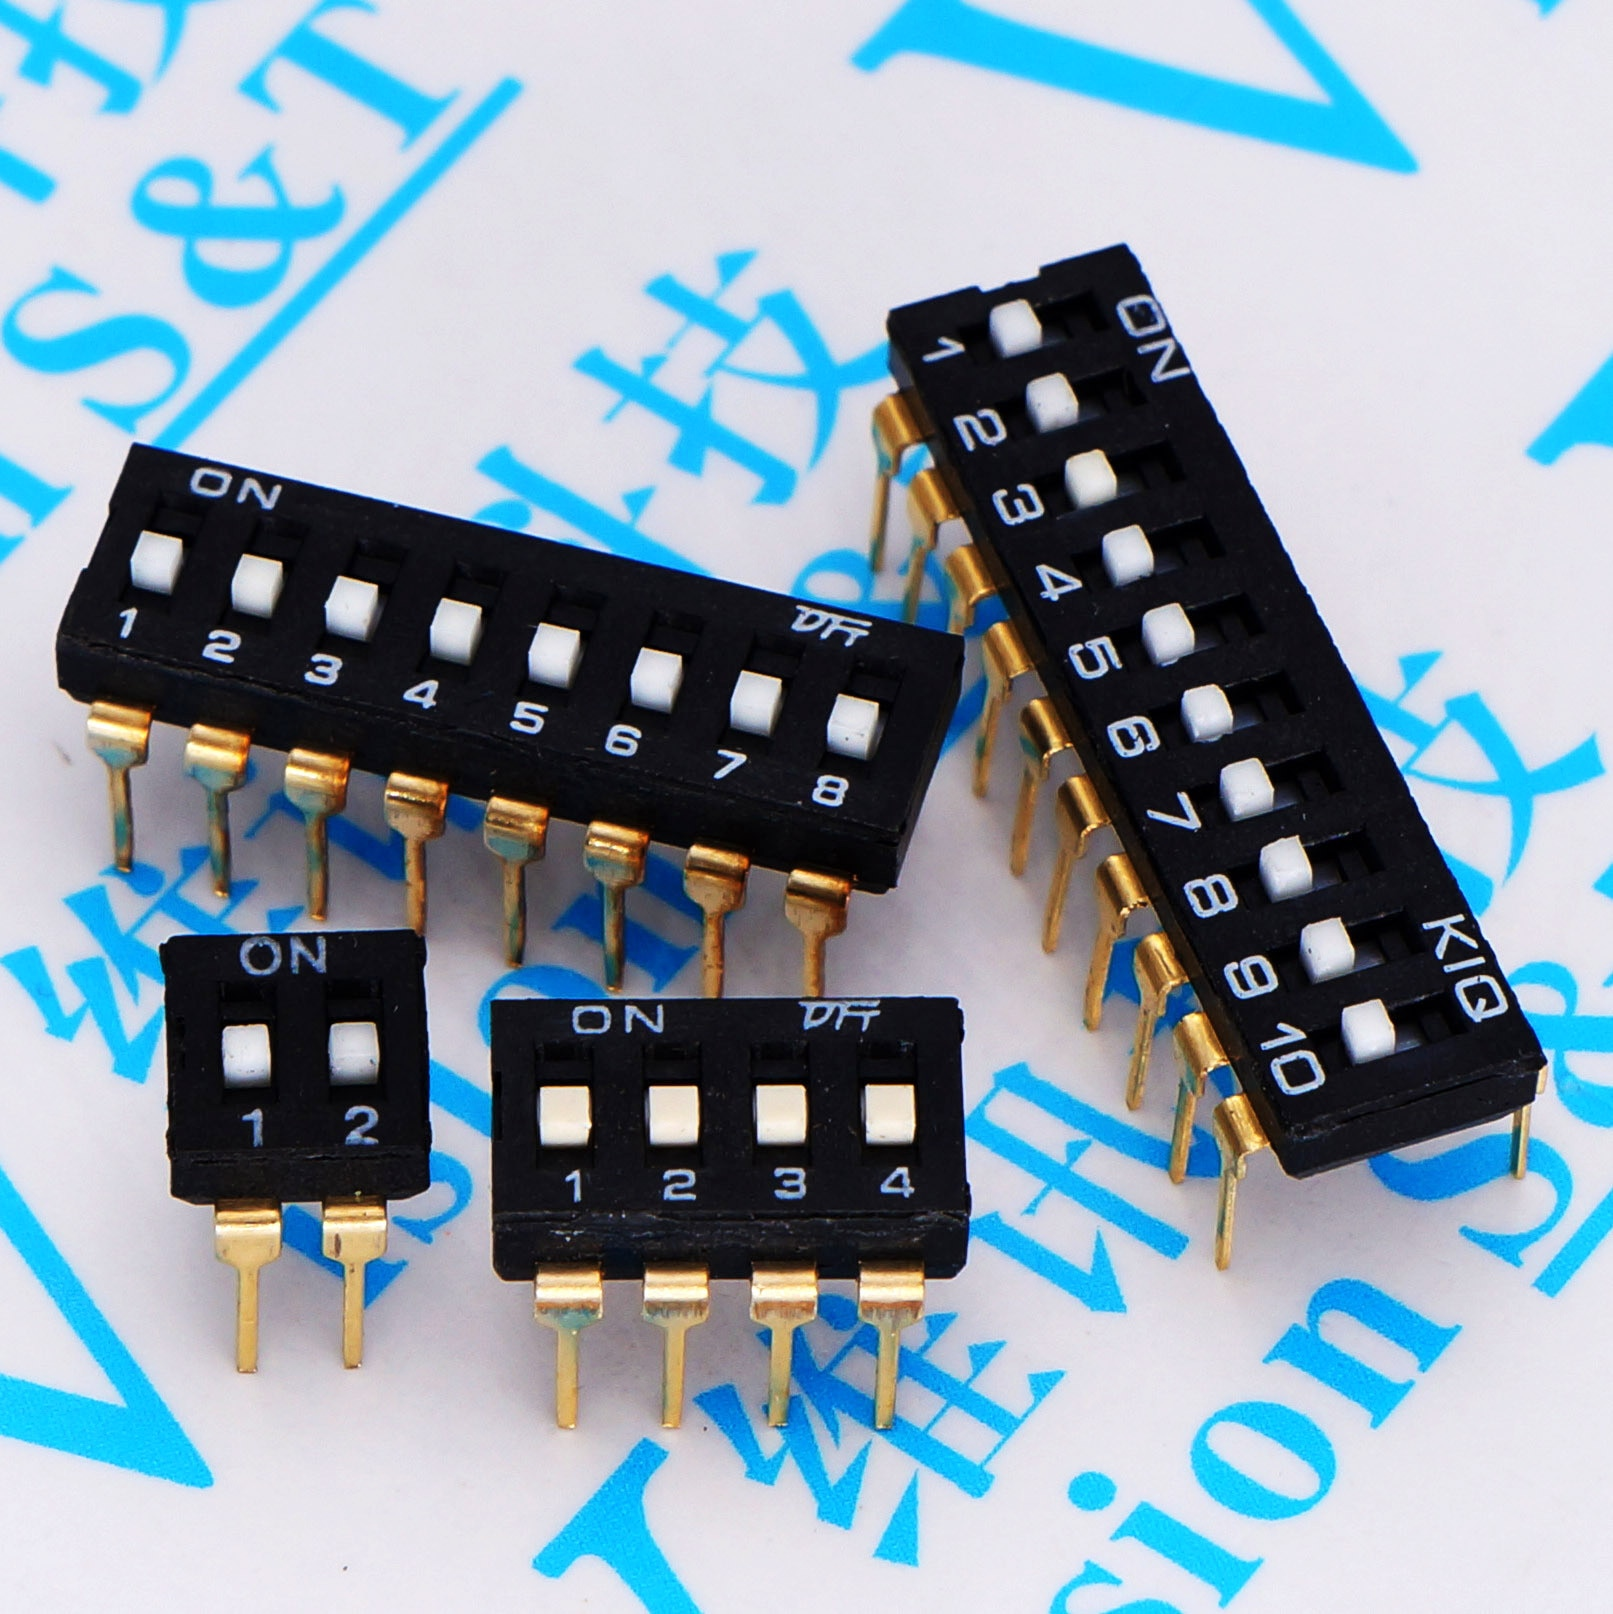 10 pces linha preta estreita dip switch 2.54mm 2.54 ki 1/2/3/4/5/6/8 p bit conector